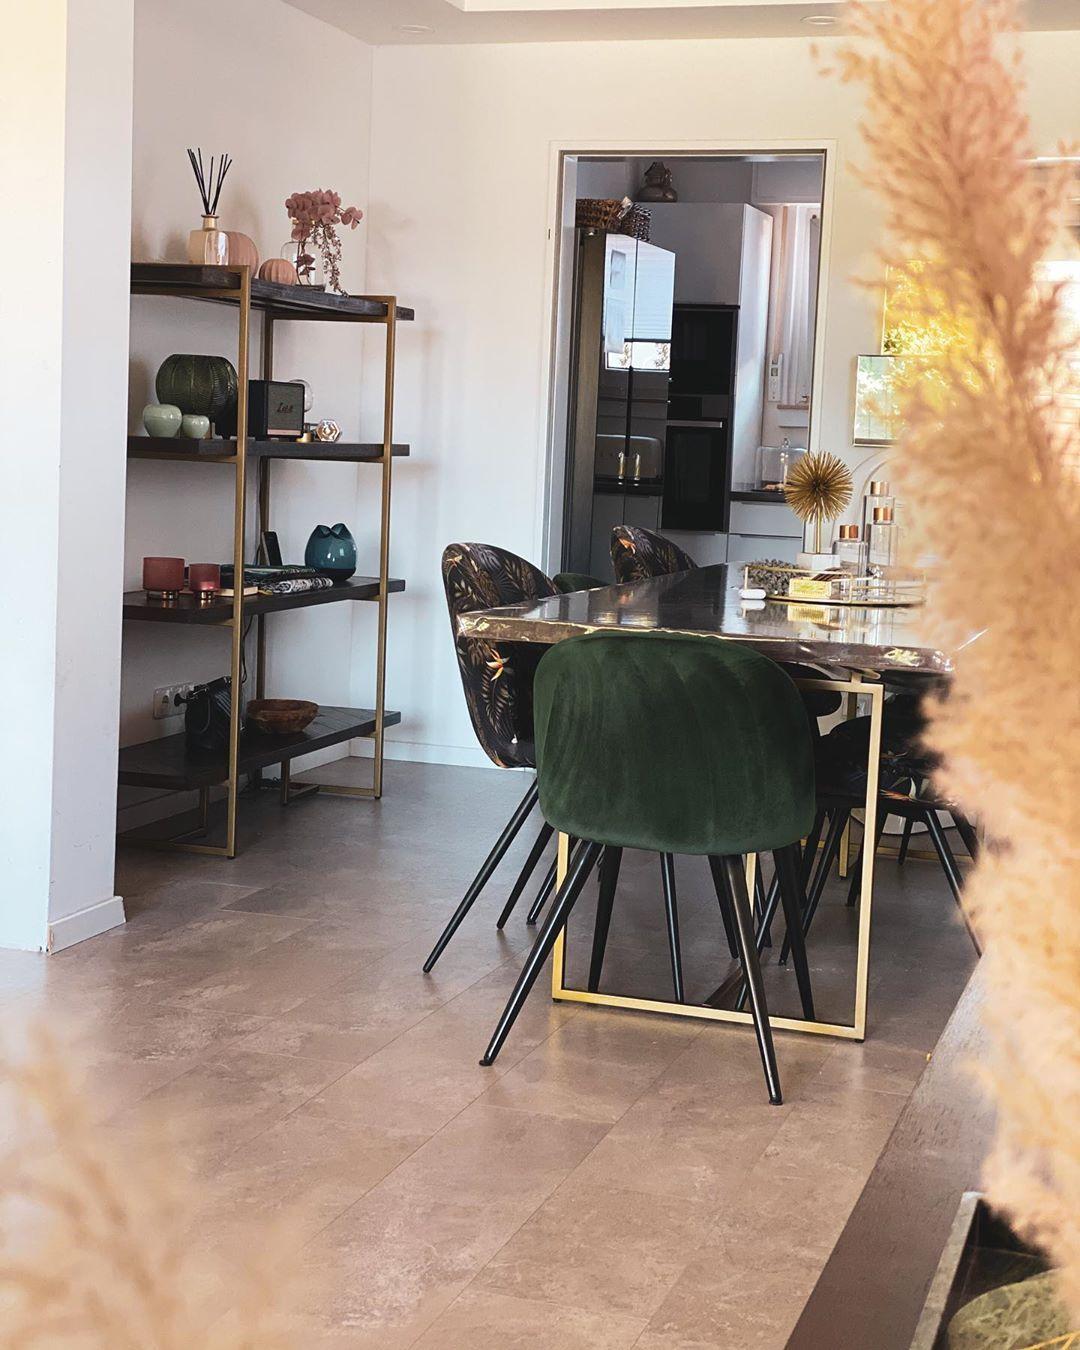 | INSPO   . . . . . . . . . . #dutchbone#westwing#westwingnow#depot#depot_online#esszimmer#dinnerroom#inspohome#inspo4homeinterior#interiordesign#interior4inspo #innеrсirсlе